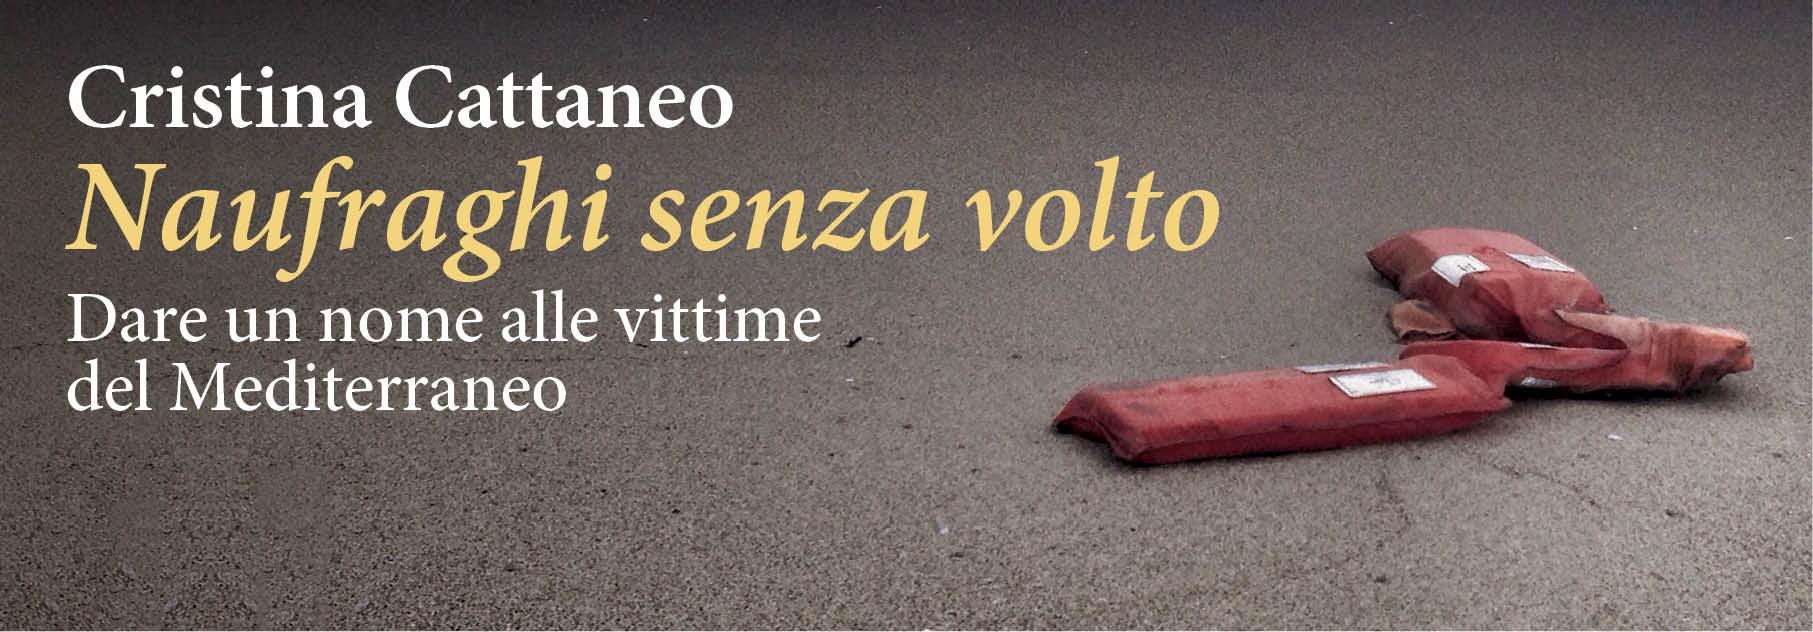 Cristina Cattaneo - Naufraghi senza volto